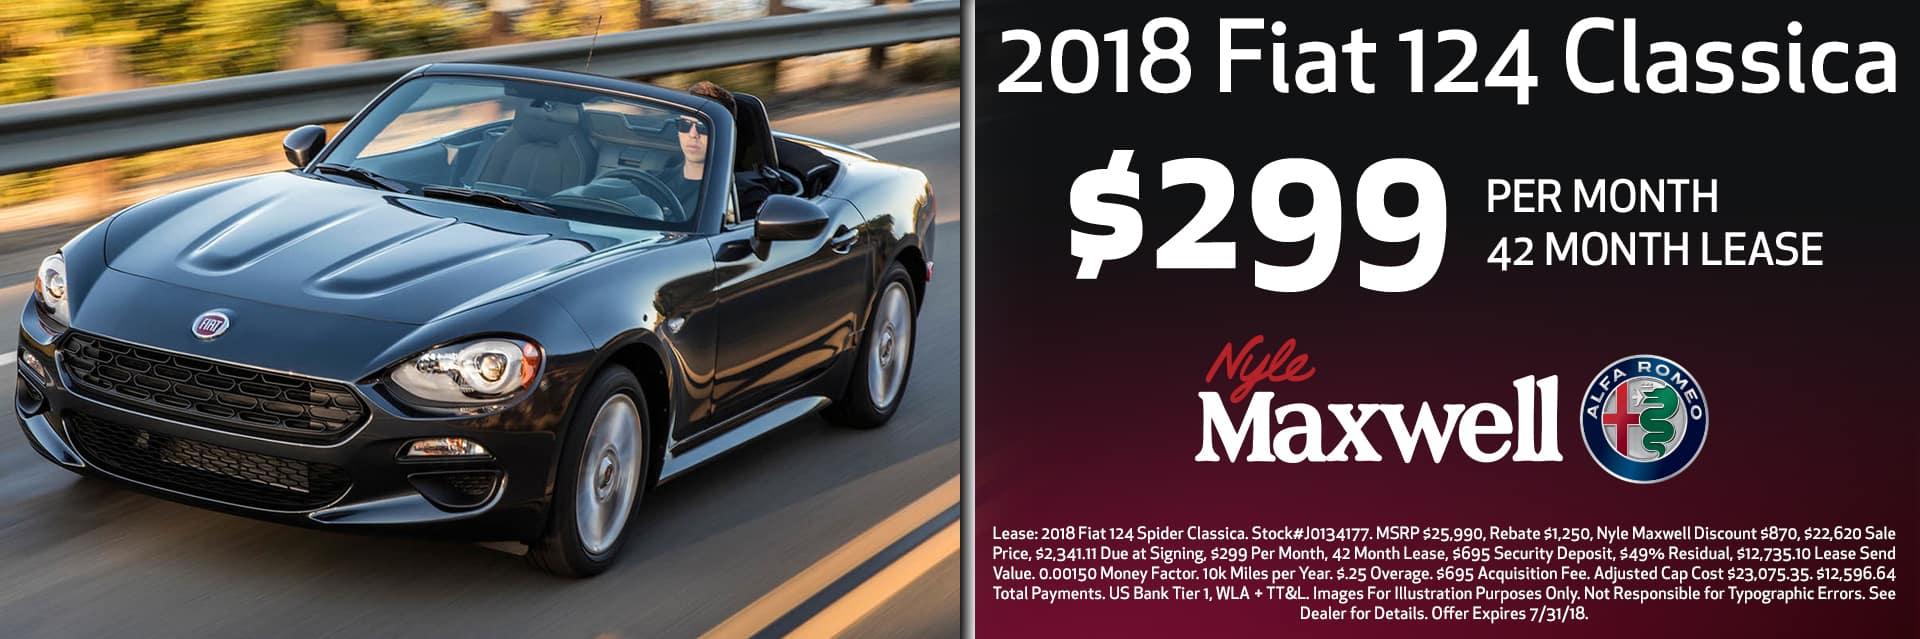 Nyle Maxwell FIAT | FIAT Dealer in Austin, TX